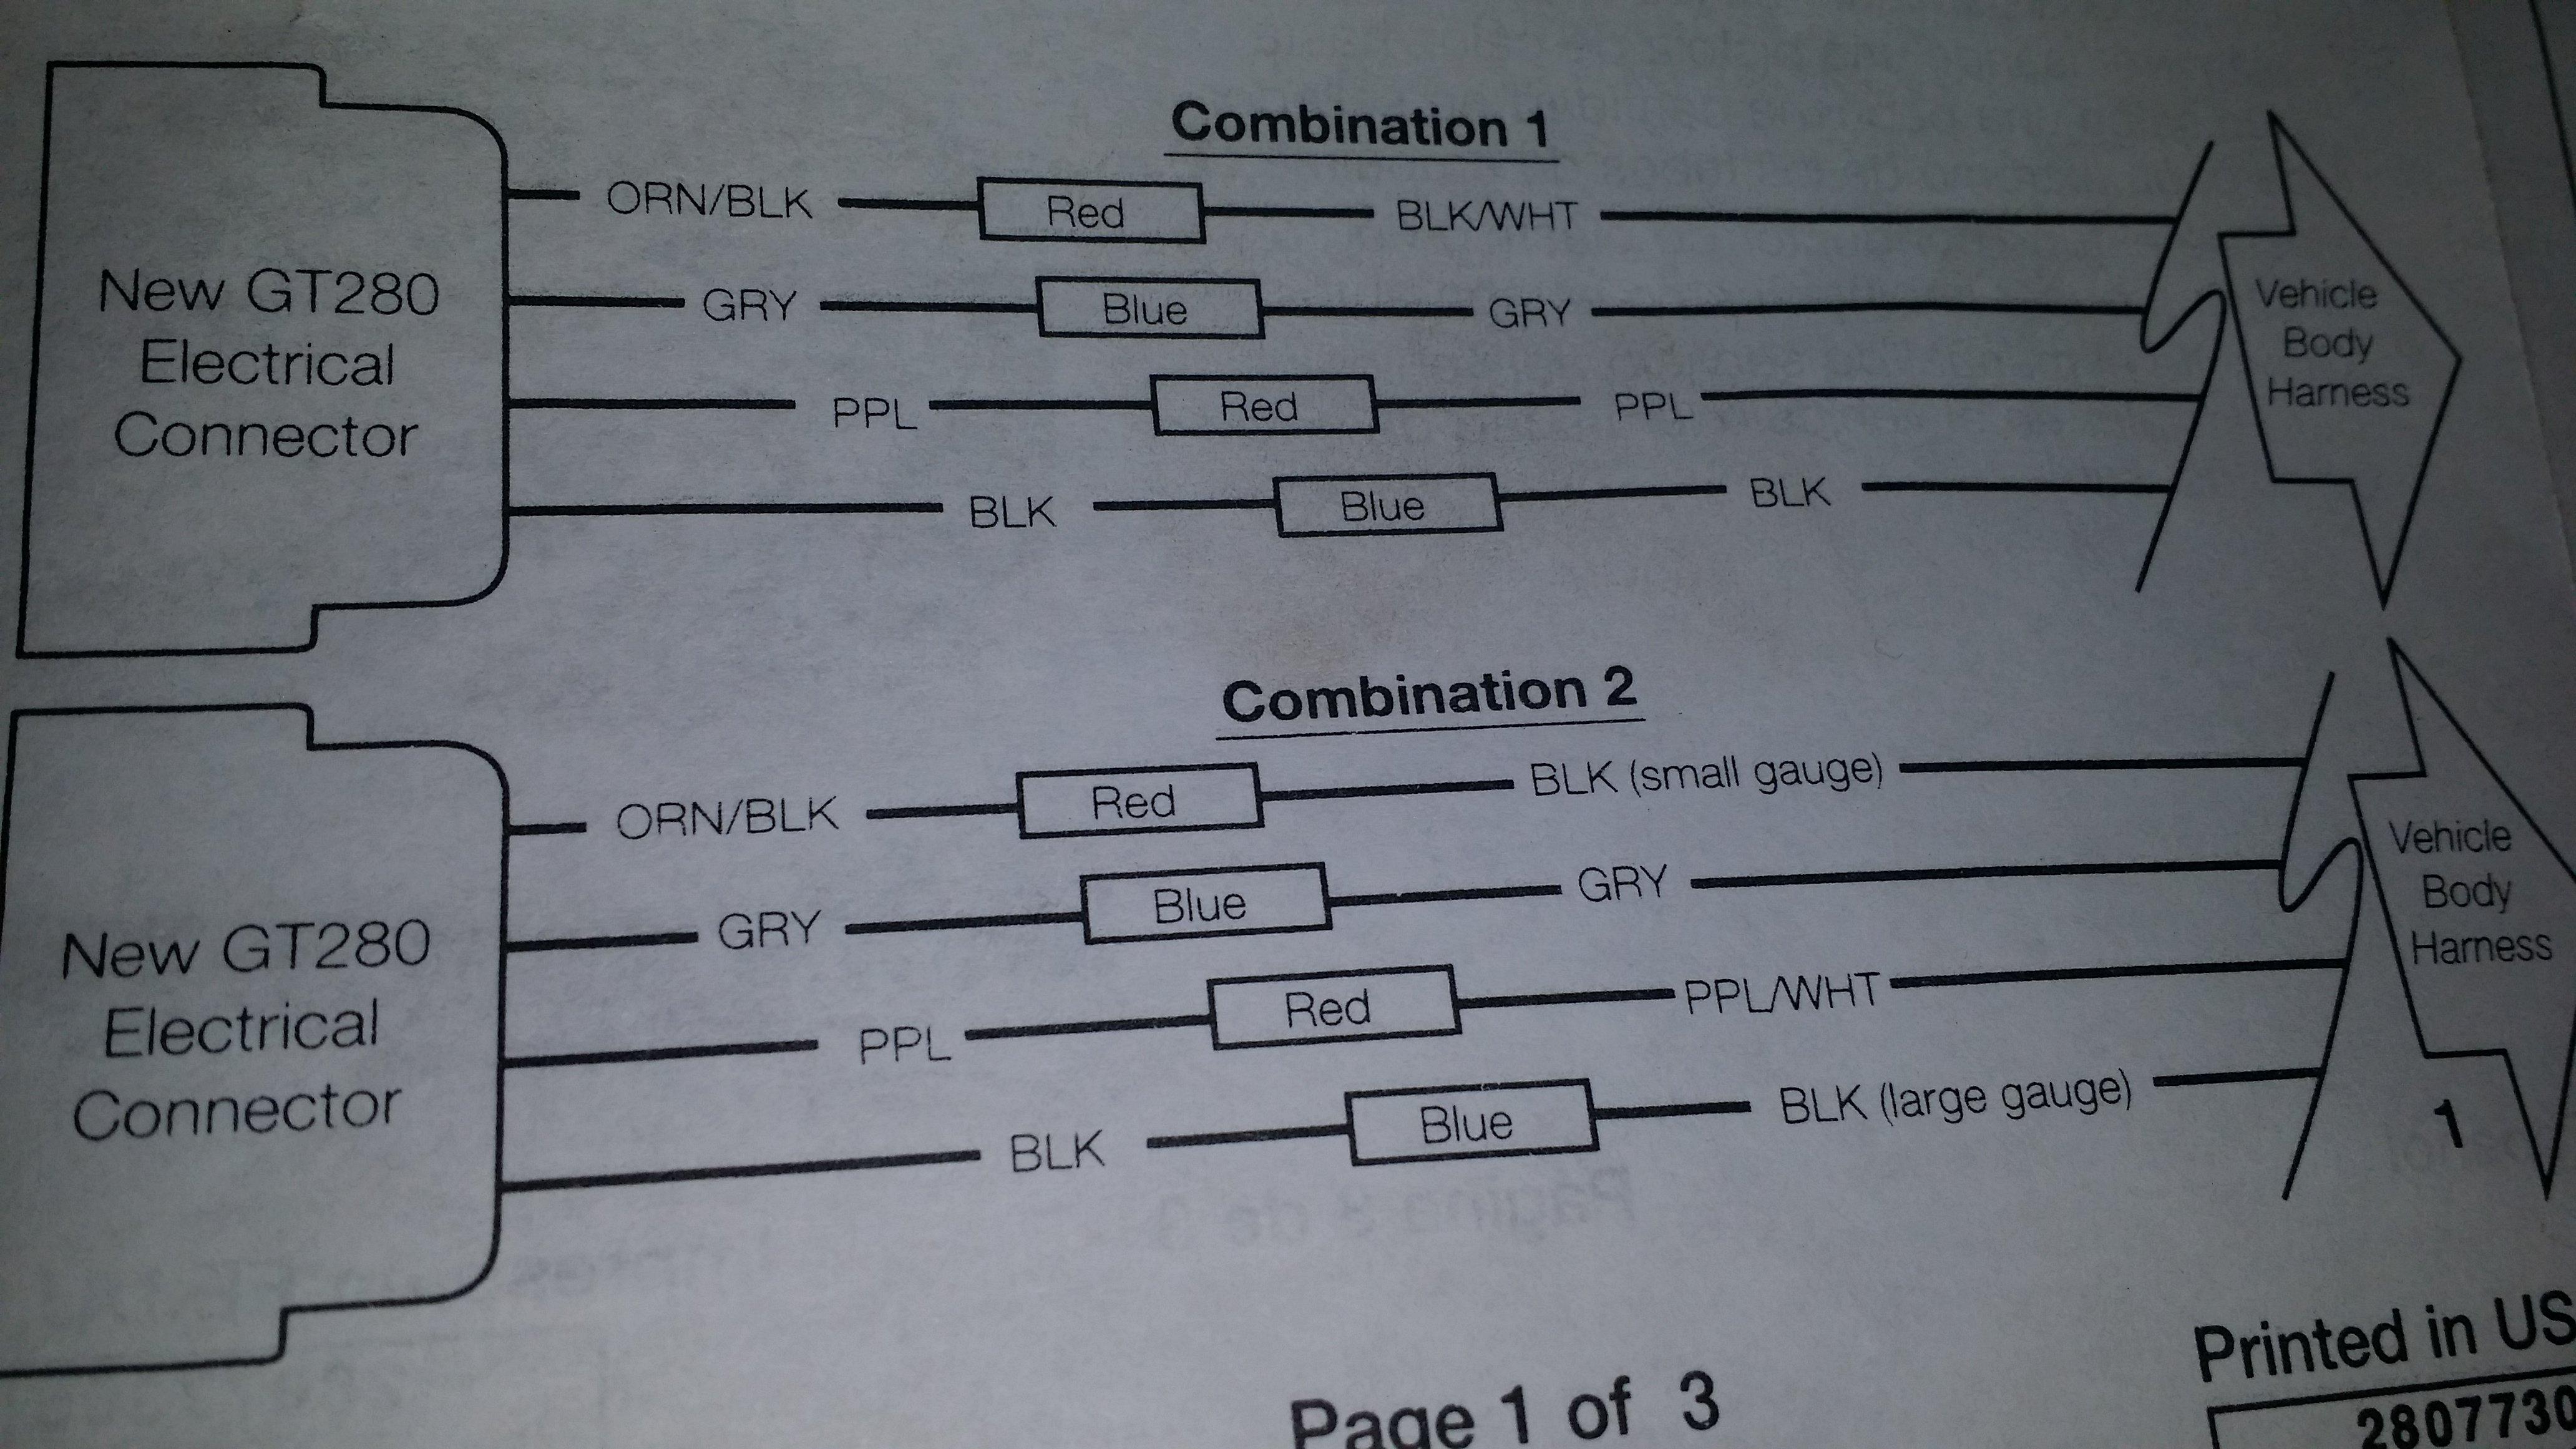 images?q=tbn:ANd9GcQh_l3eQ5xwiPy07kGEXjmjgmBKBRB7H2mRxCGhv1tFWg5c_mWT 2003 Chevy Silverado 1500 Fuel Pump Wiring Diagram